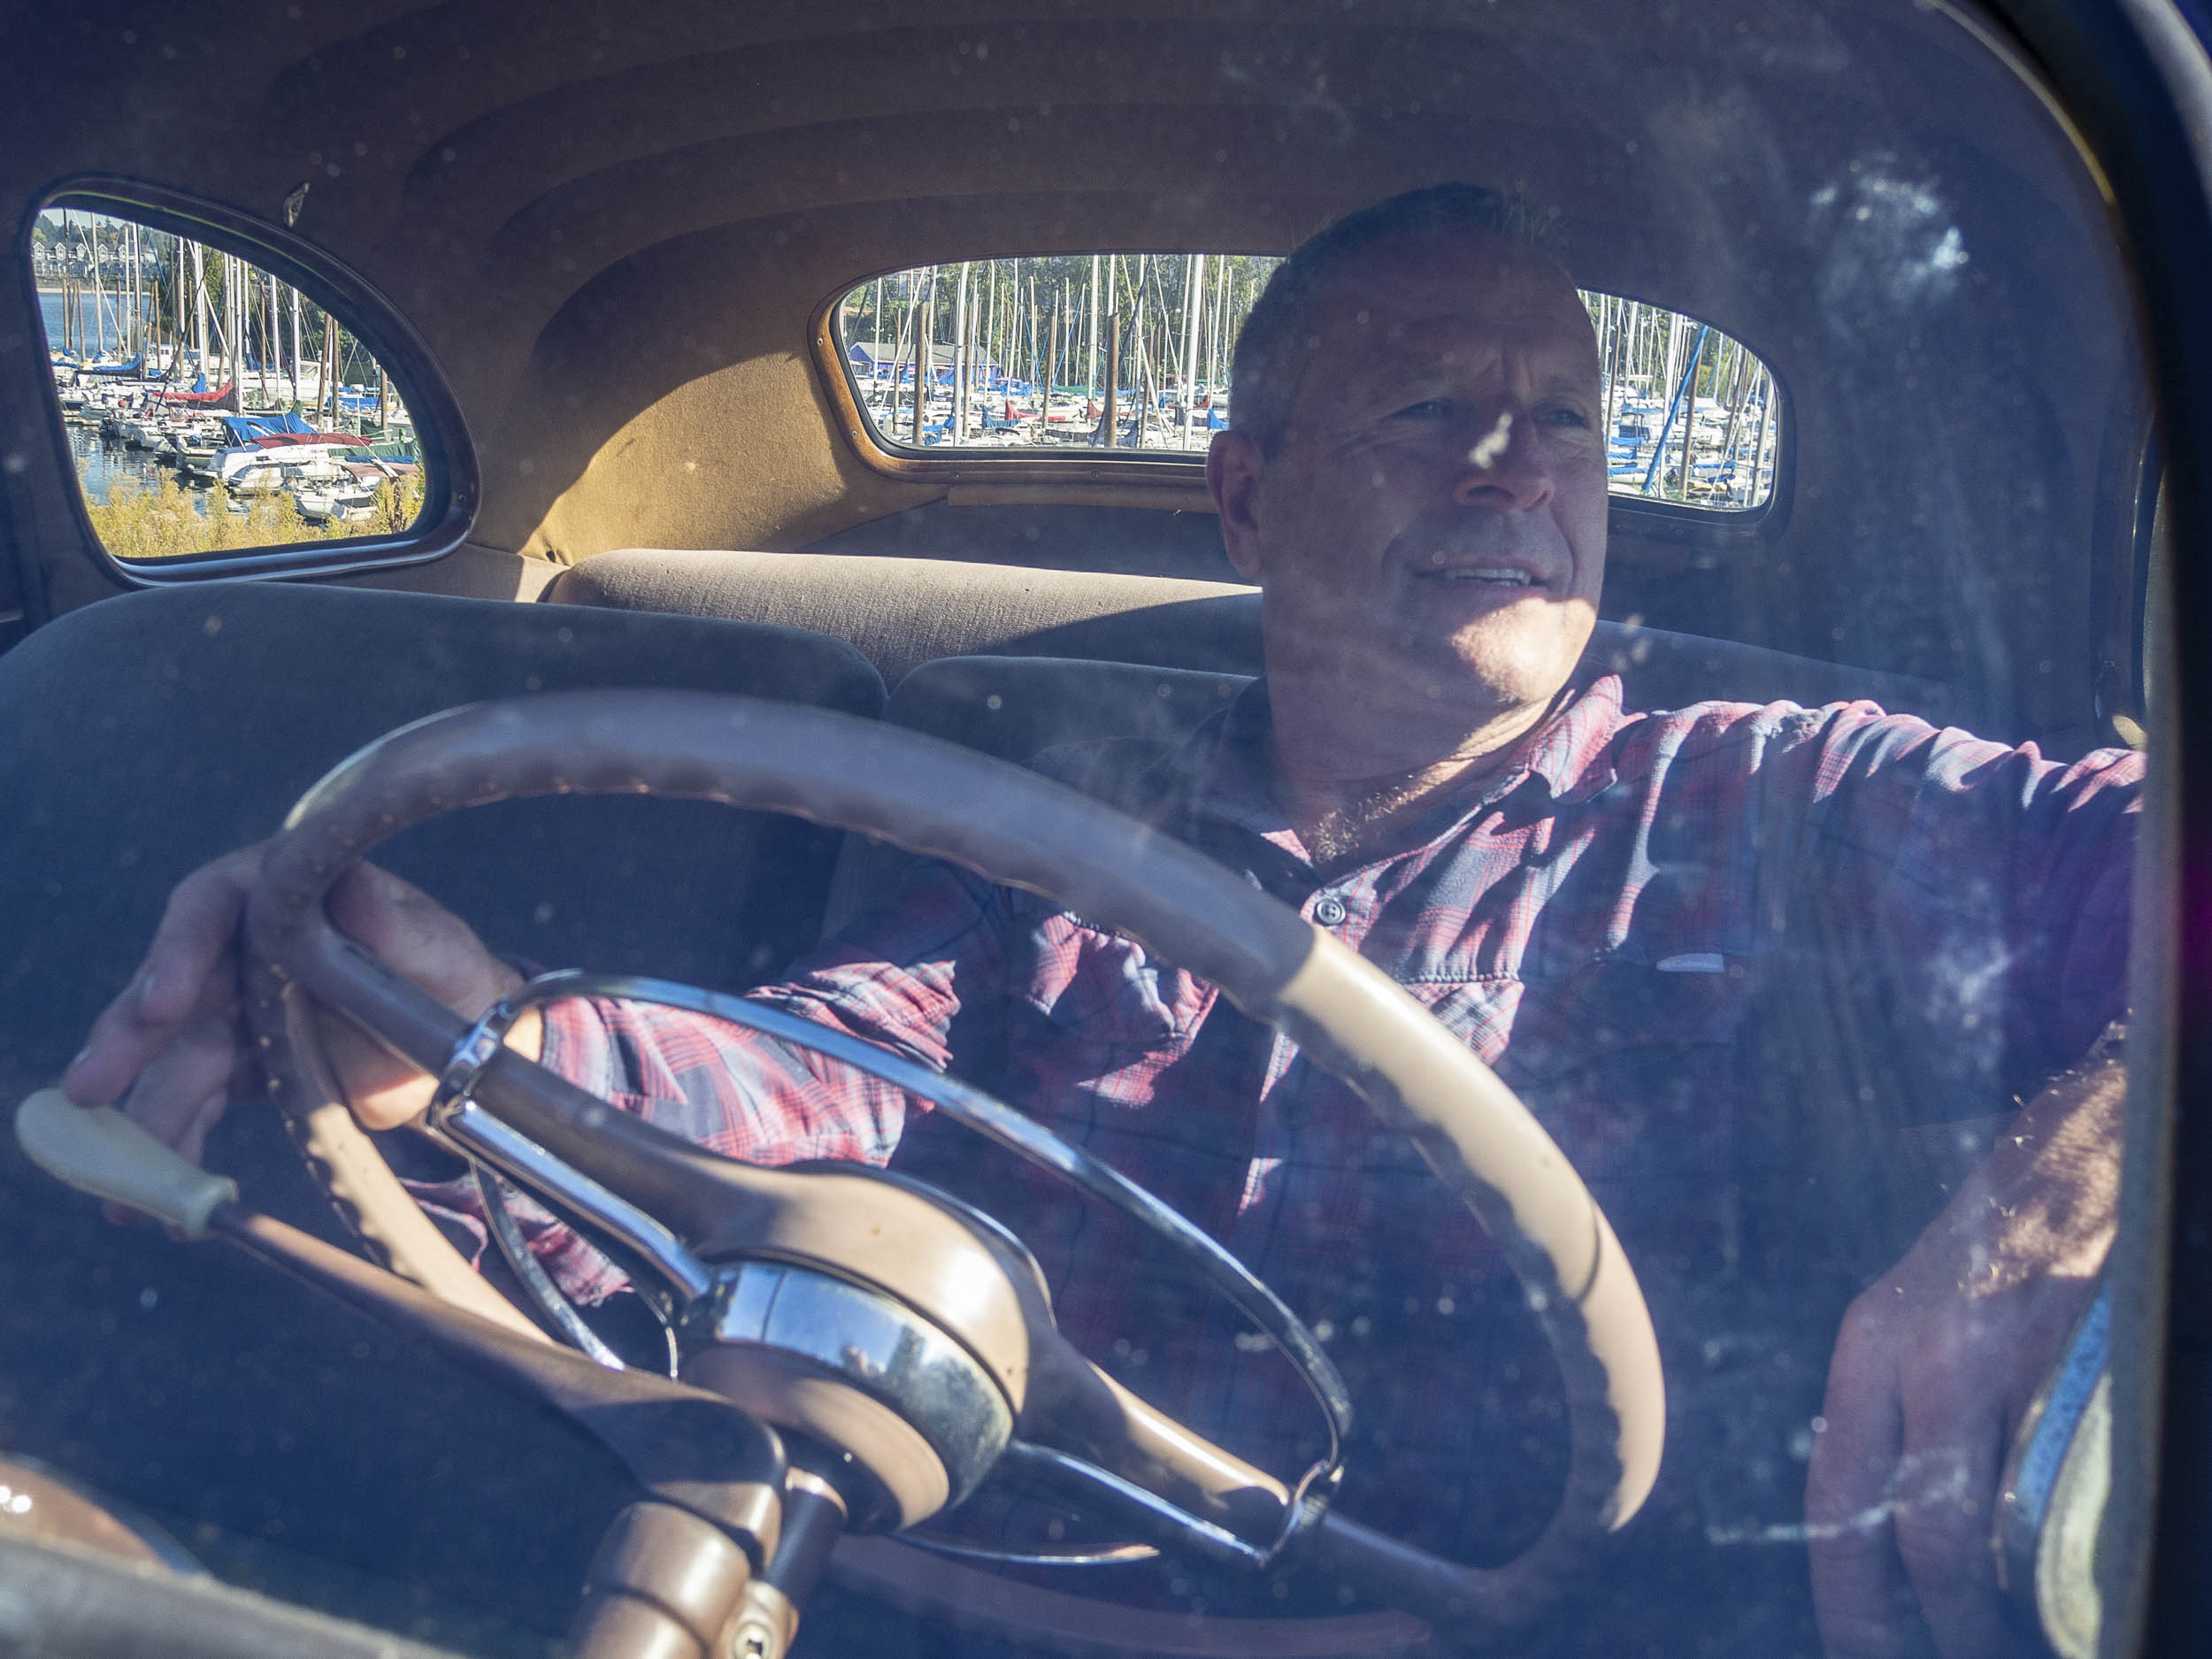 Scott Rich in his 1941 Chevrolet Master Deluxe